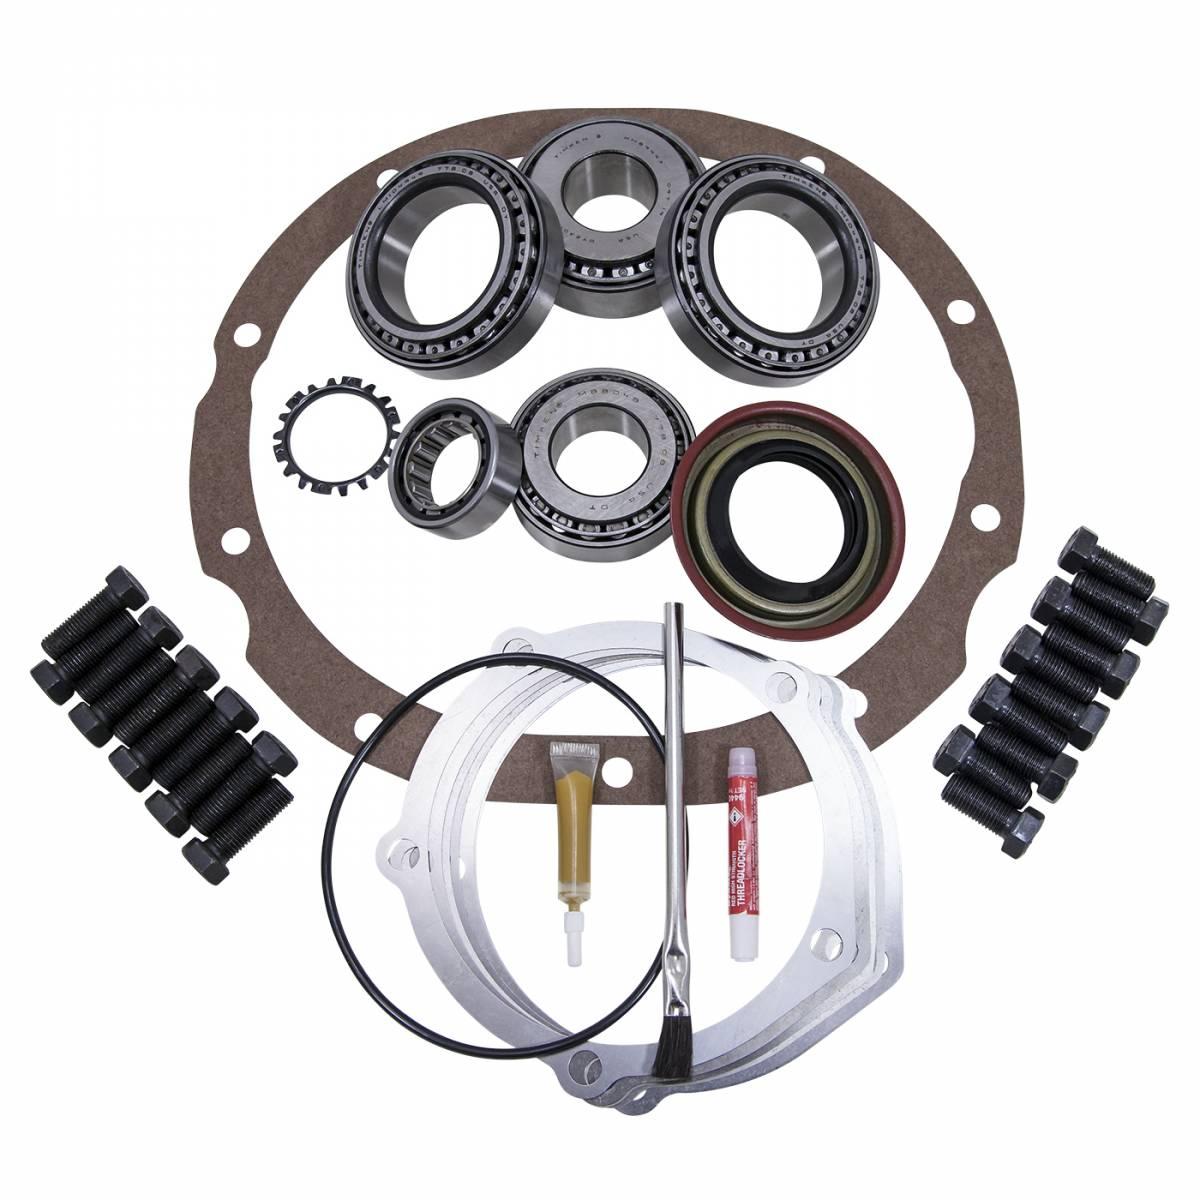 Yukon Gear #YK F9-HDC-SPC Yukon Differential Master Overhaul